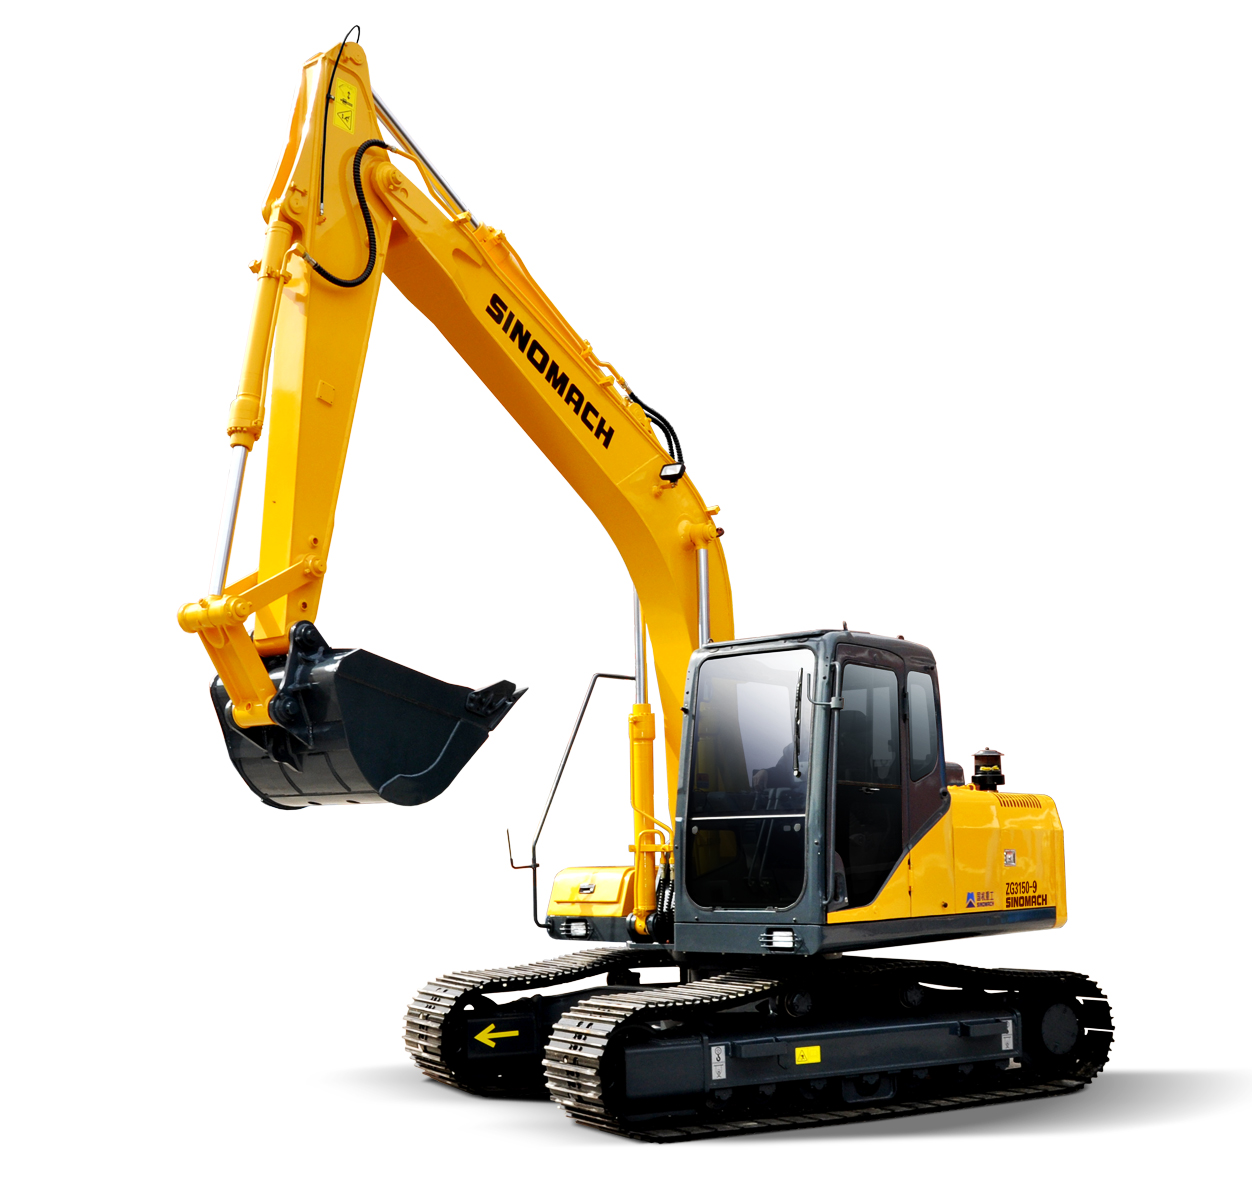 ZG3235-9 ZG3235-9C履带挖掘机